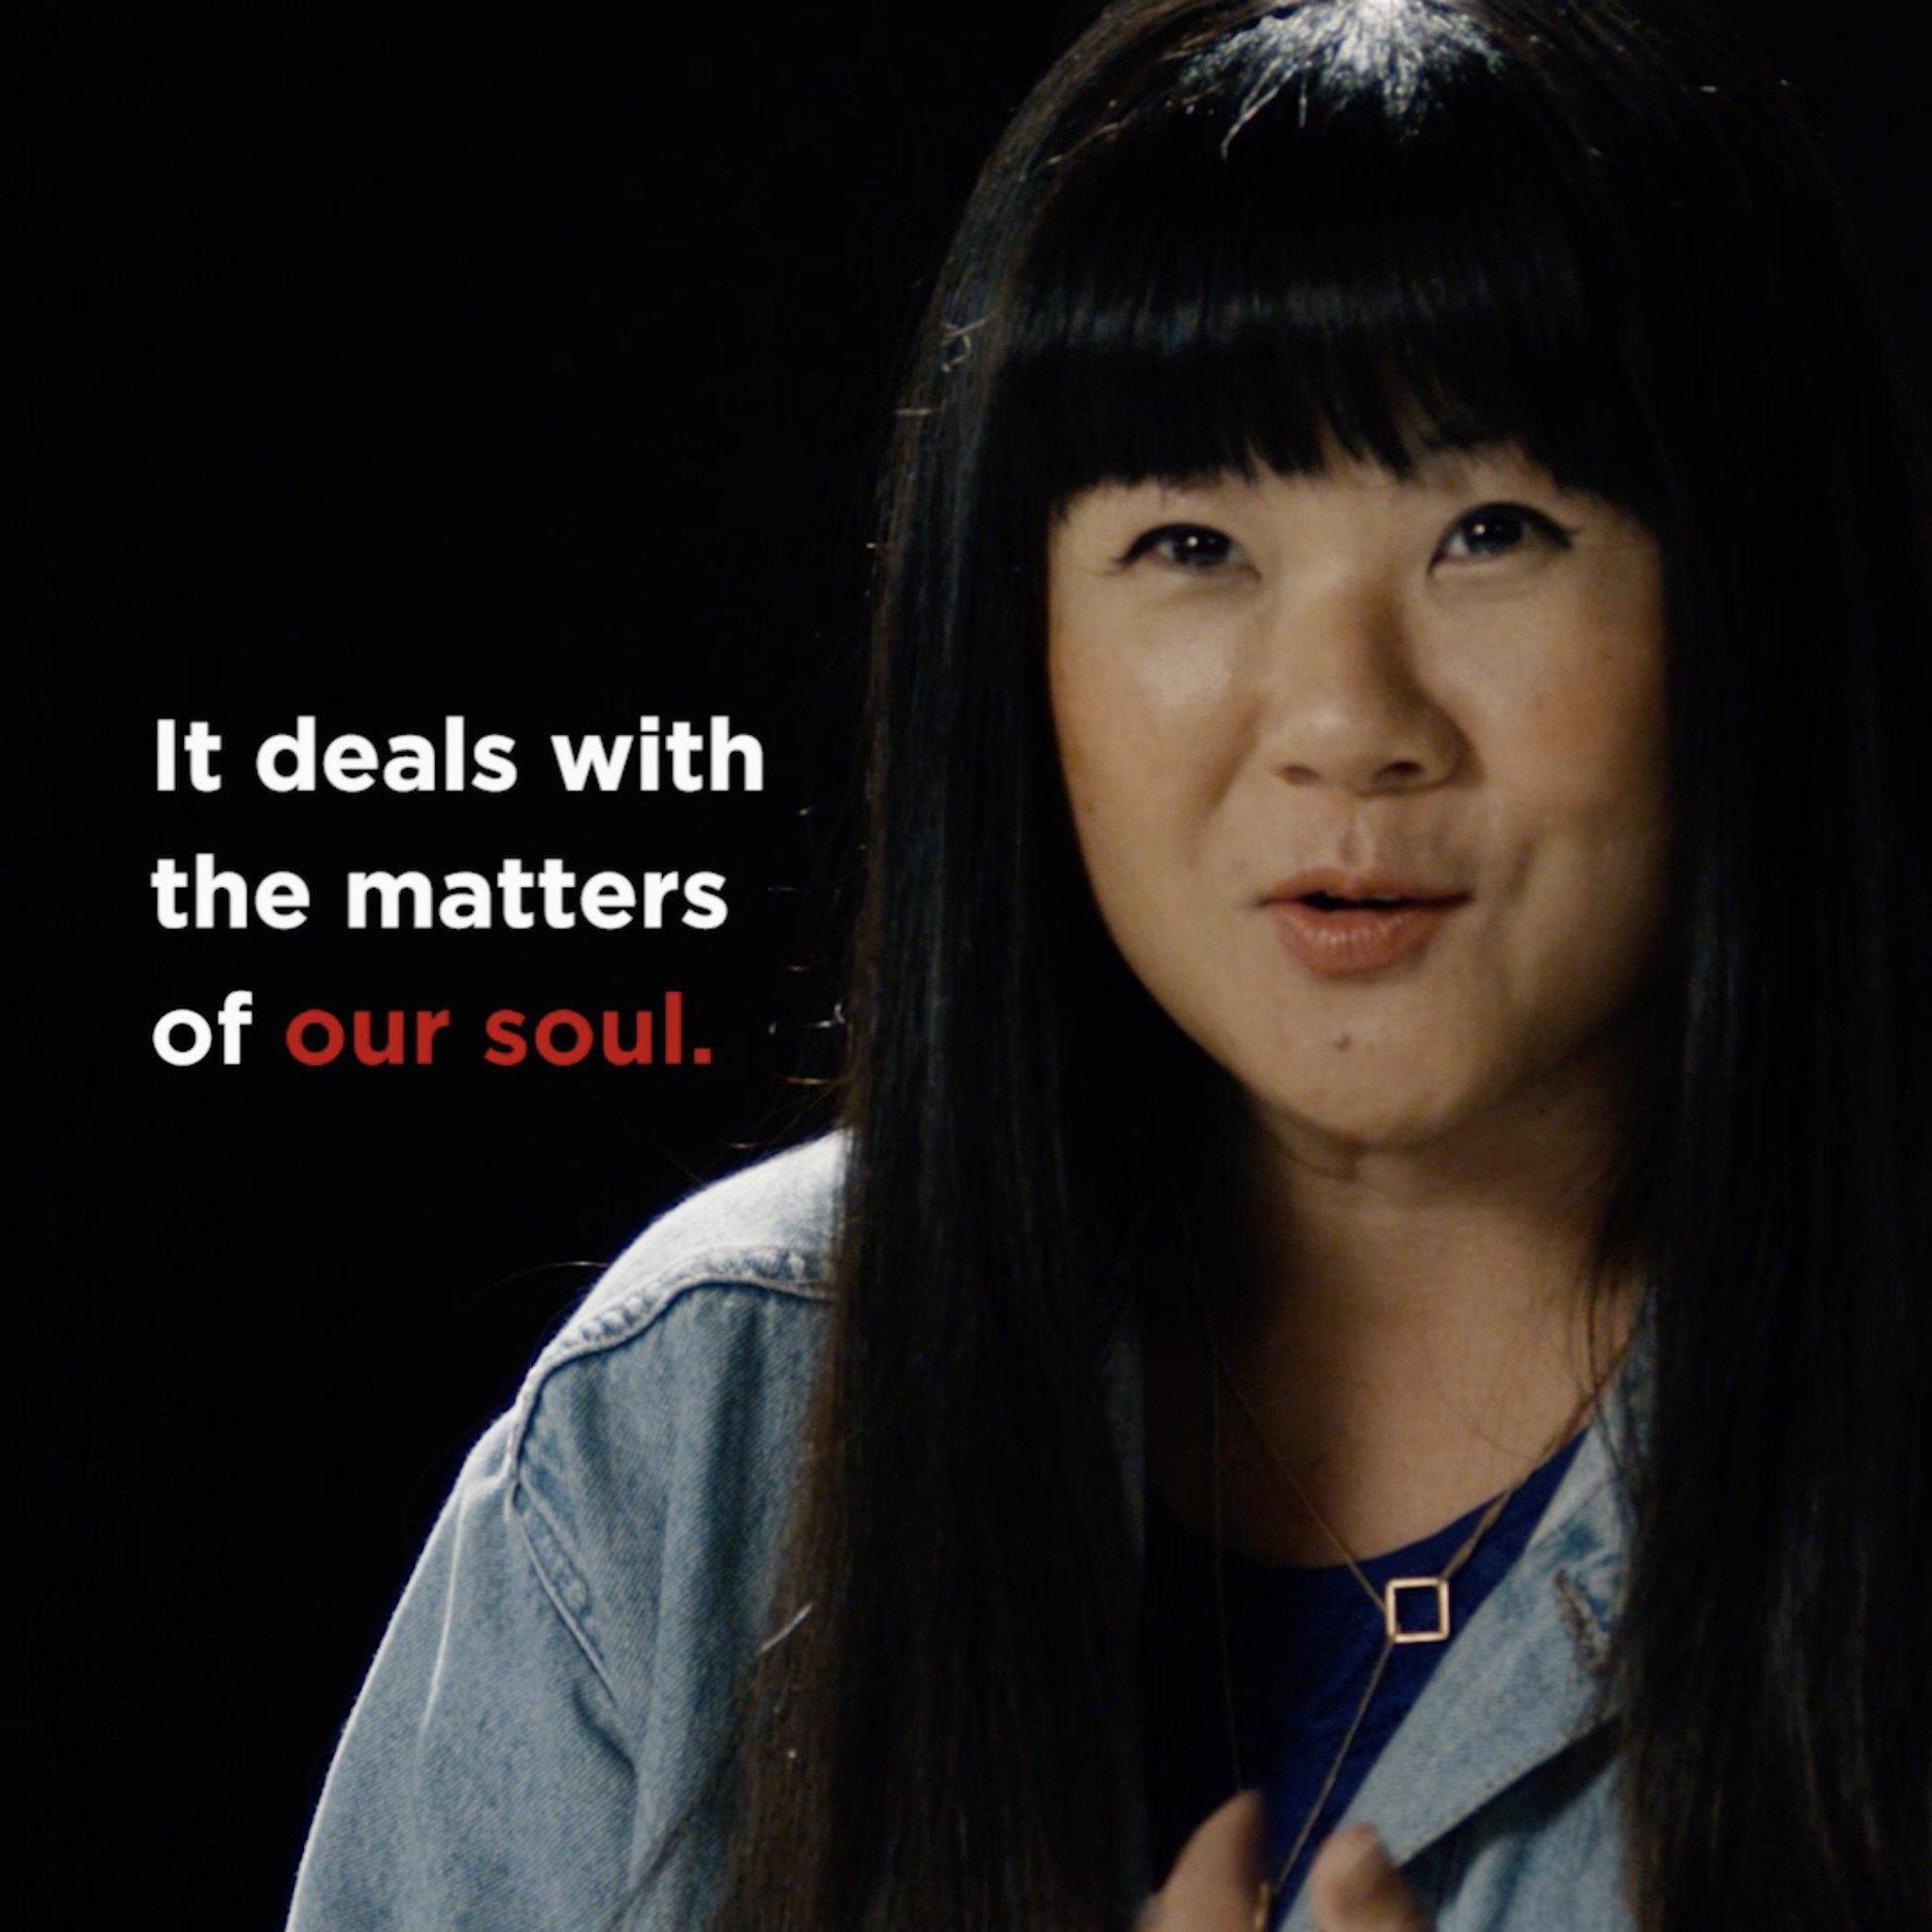 Representation matters. #FirstTimeISawMe https://t.co/dblPbAS1xB